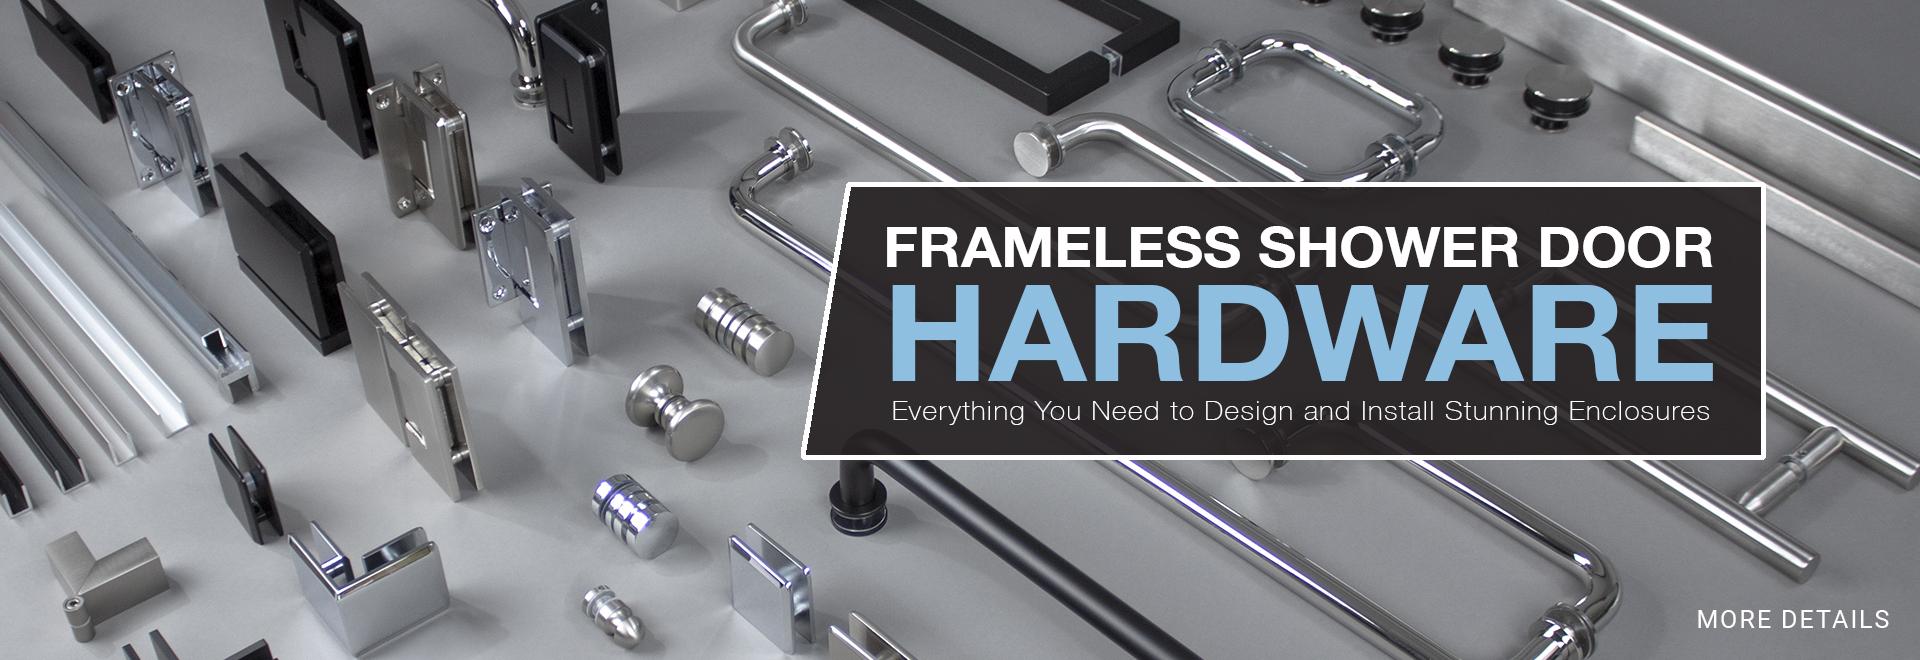 Frameless Hardware Company Home Page